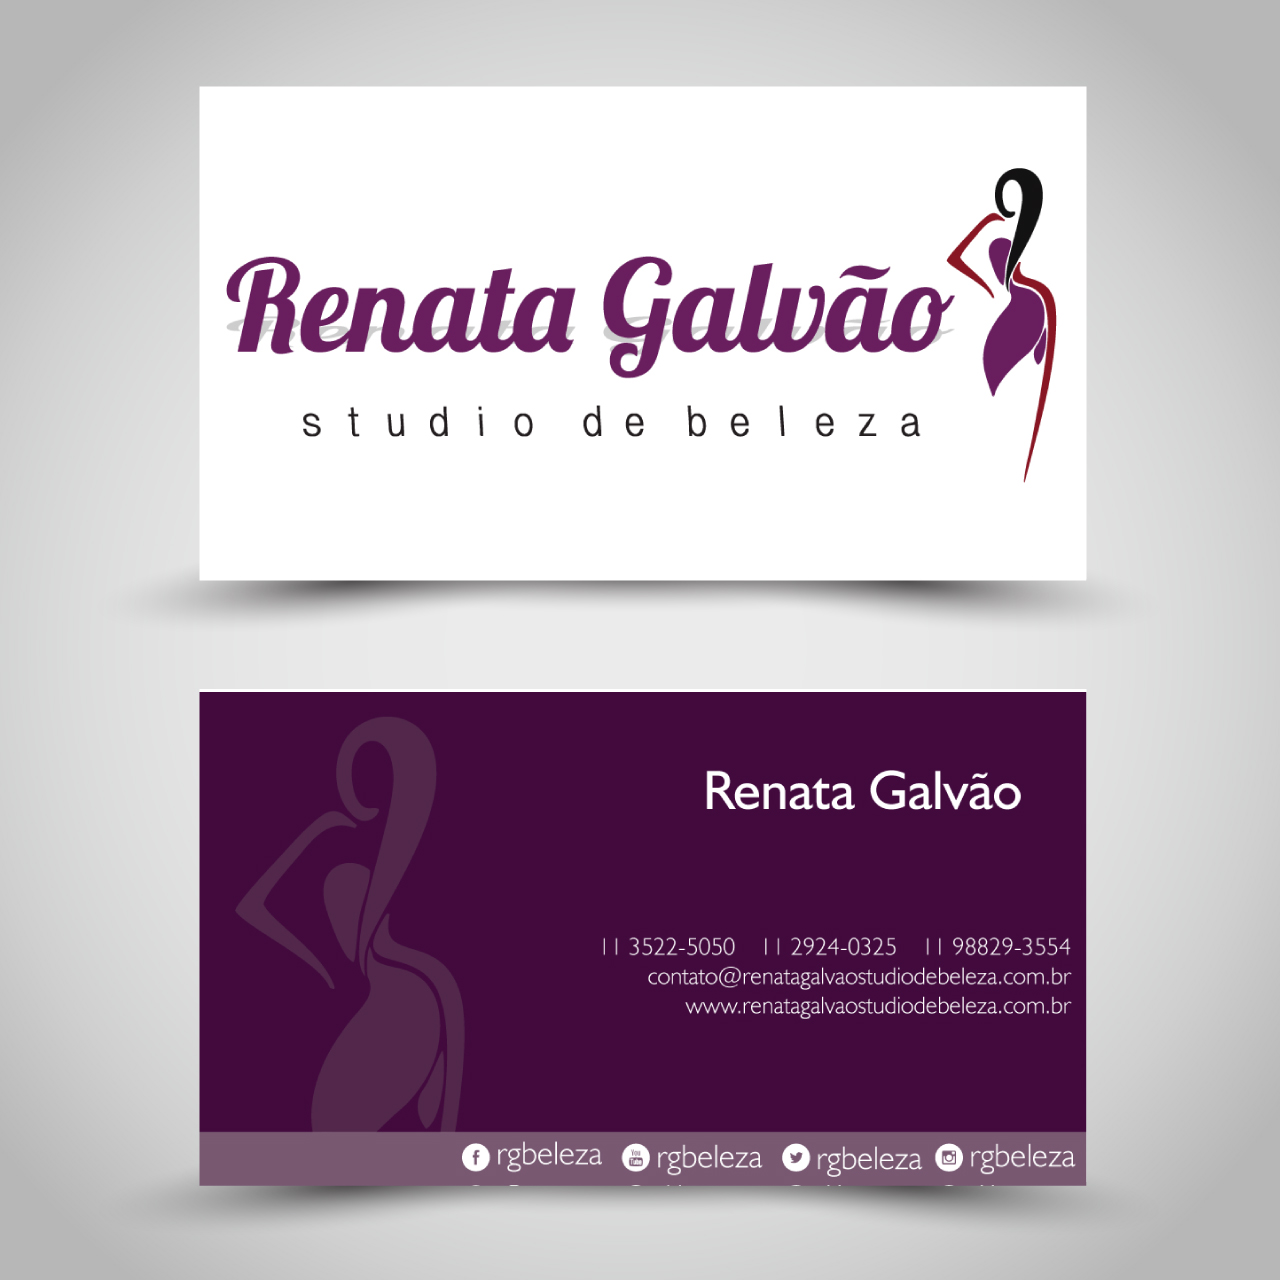 carta_renata